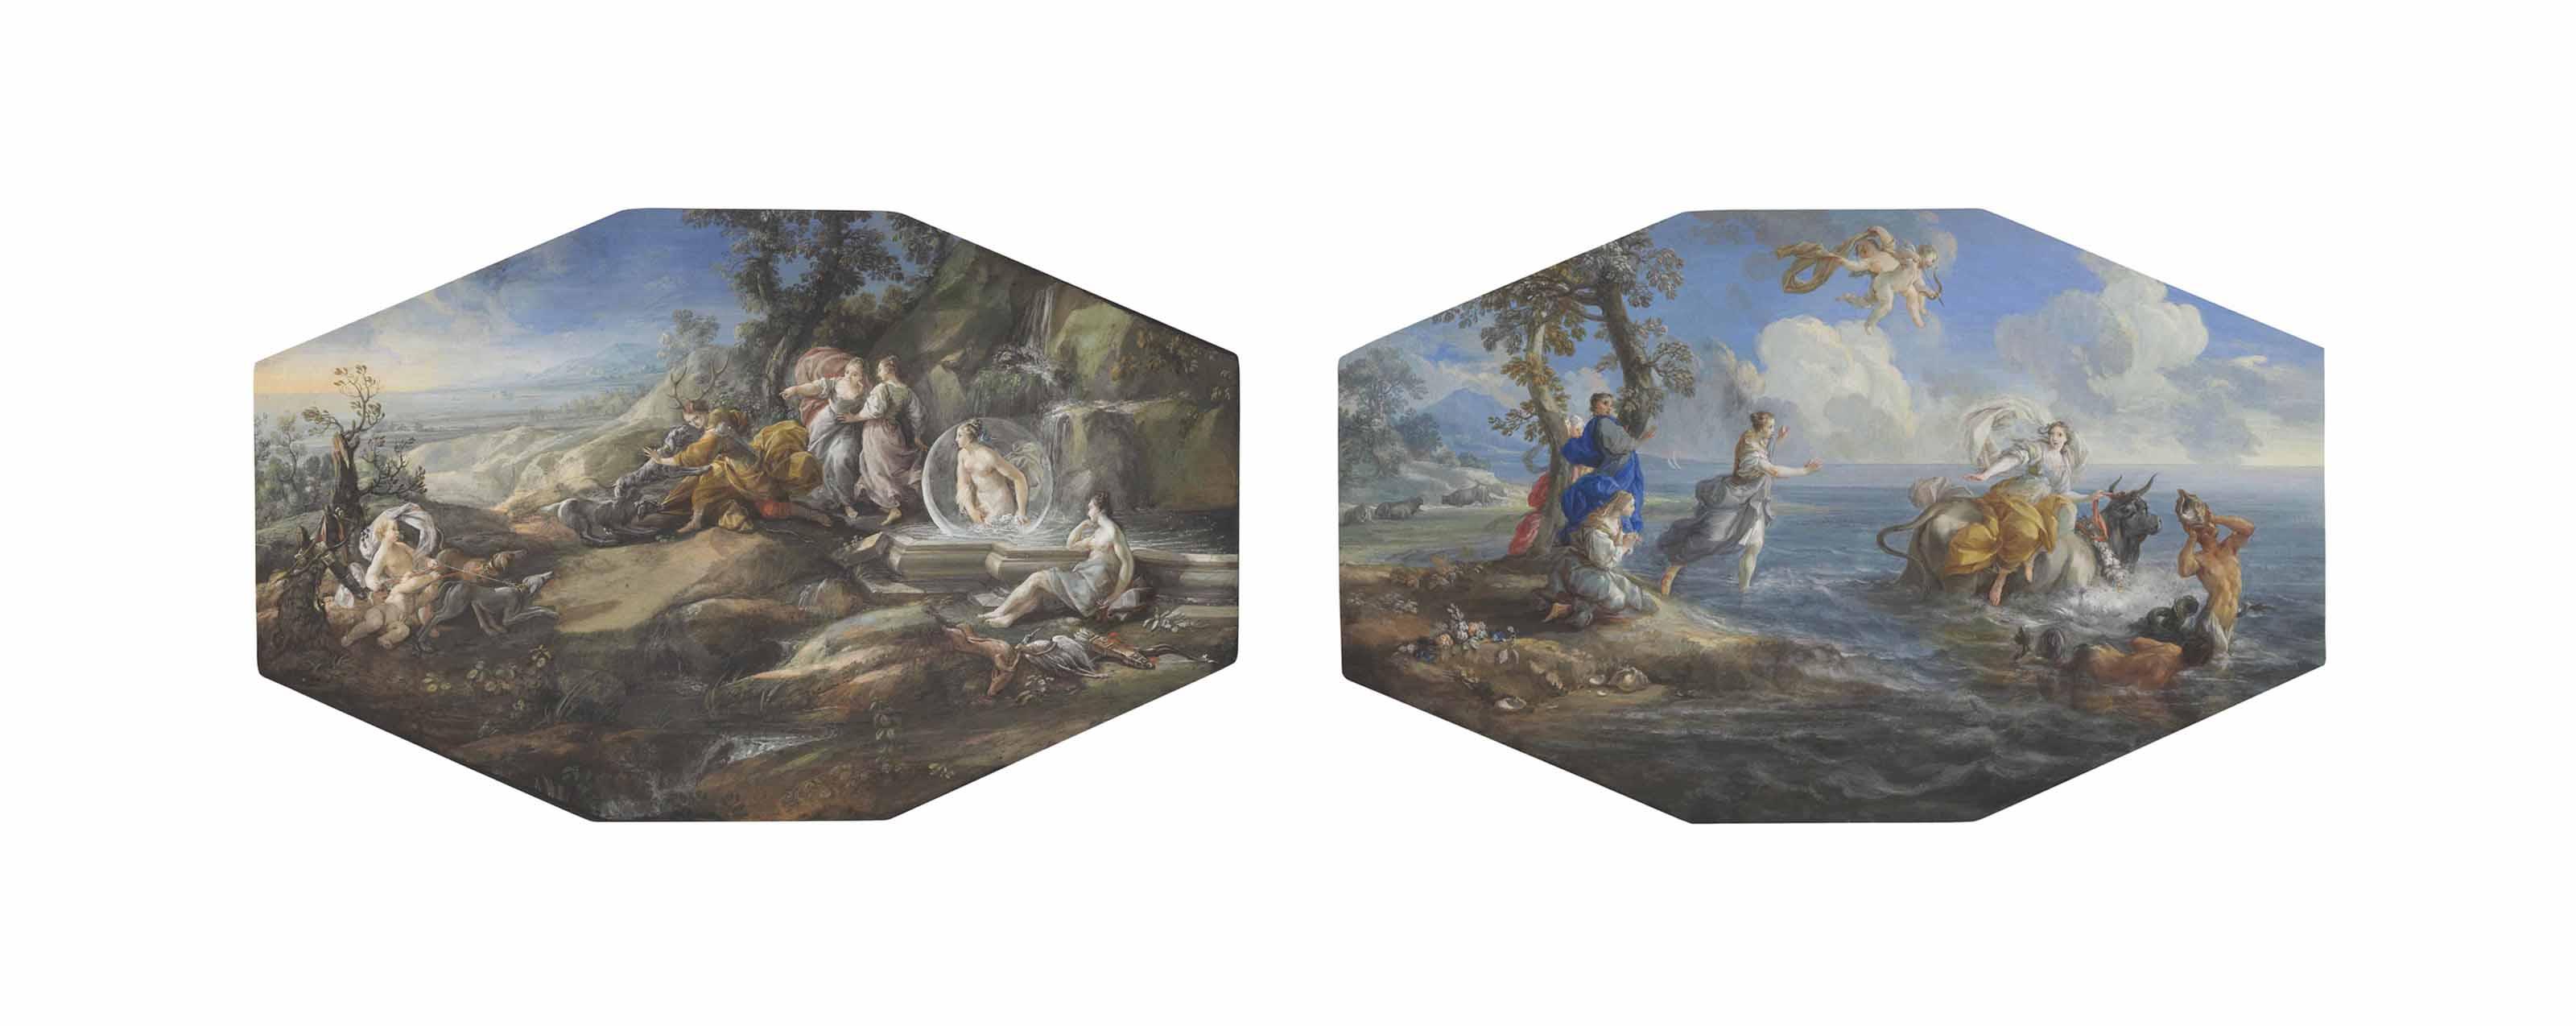 Pietro Bianchi (Rome 1694-1740)